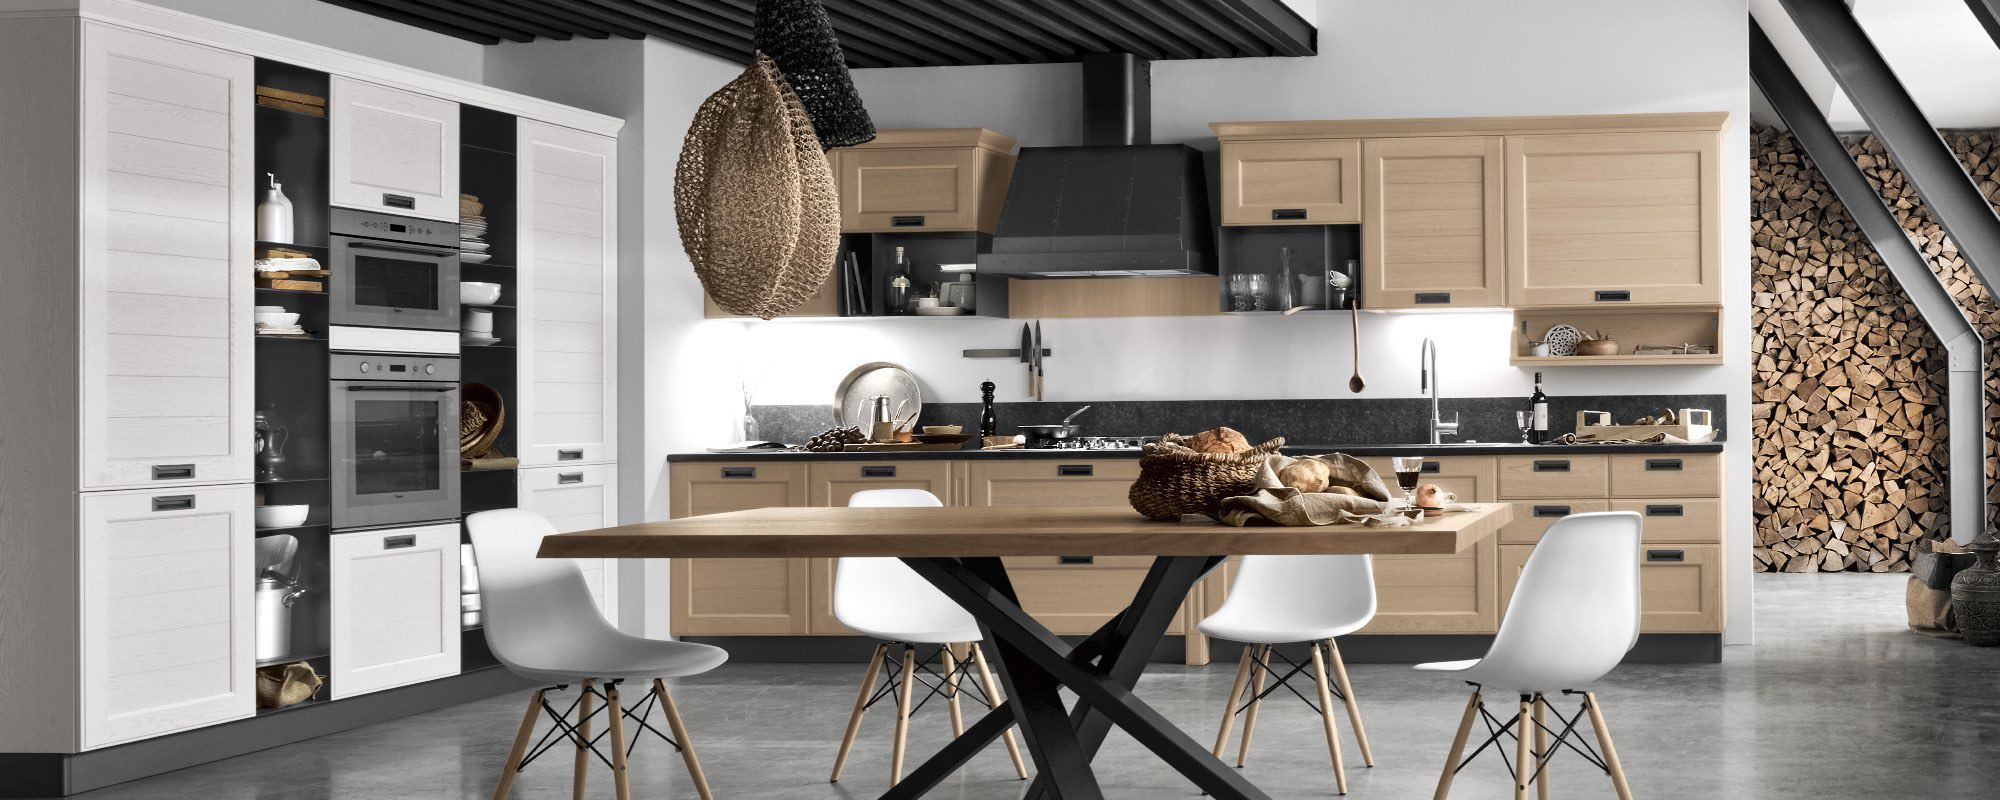 York cucine stosa for Cucine moderne contemporanee